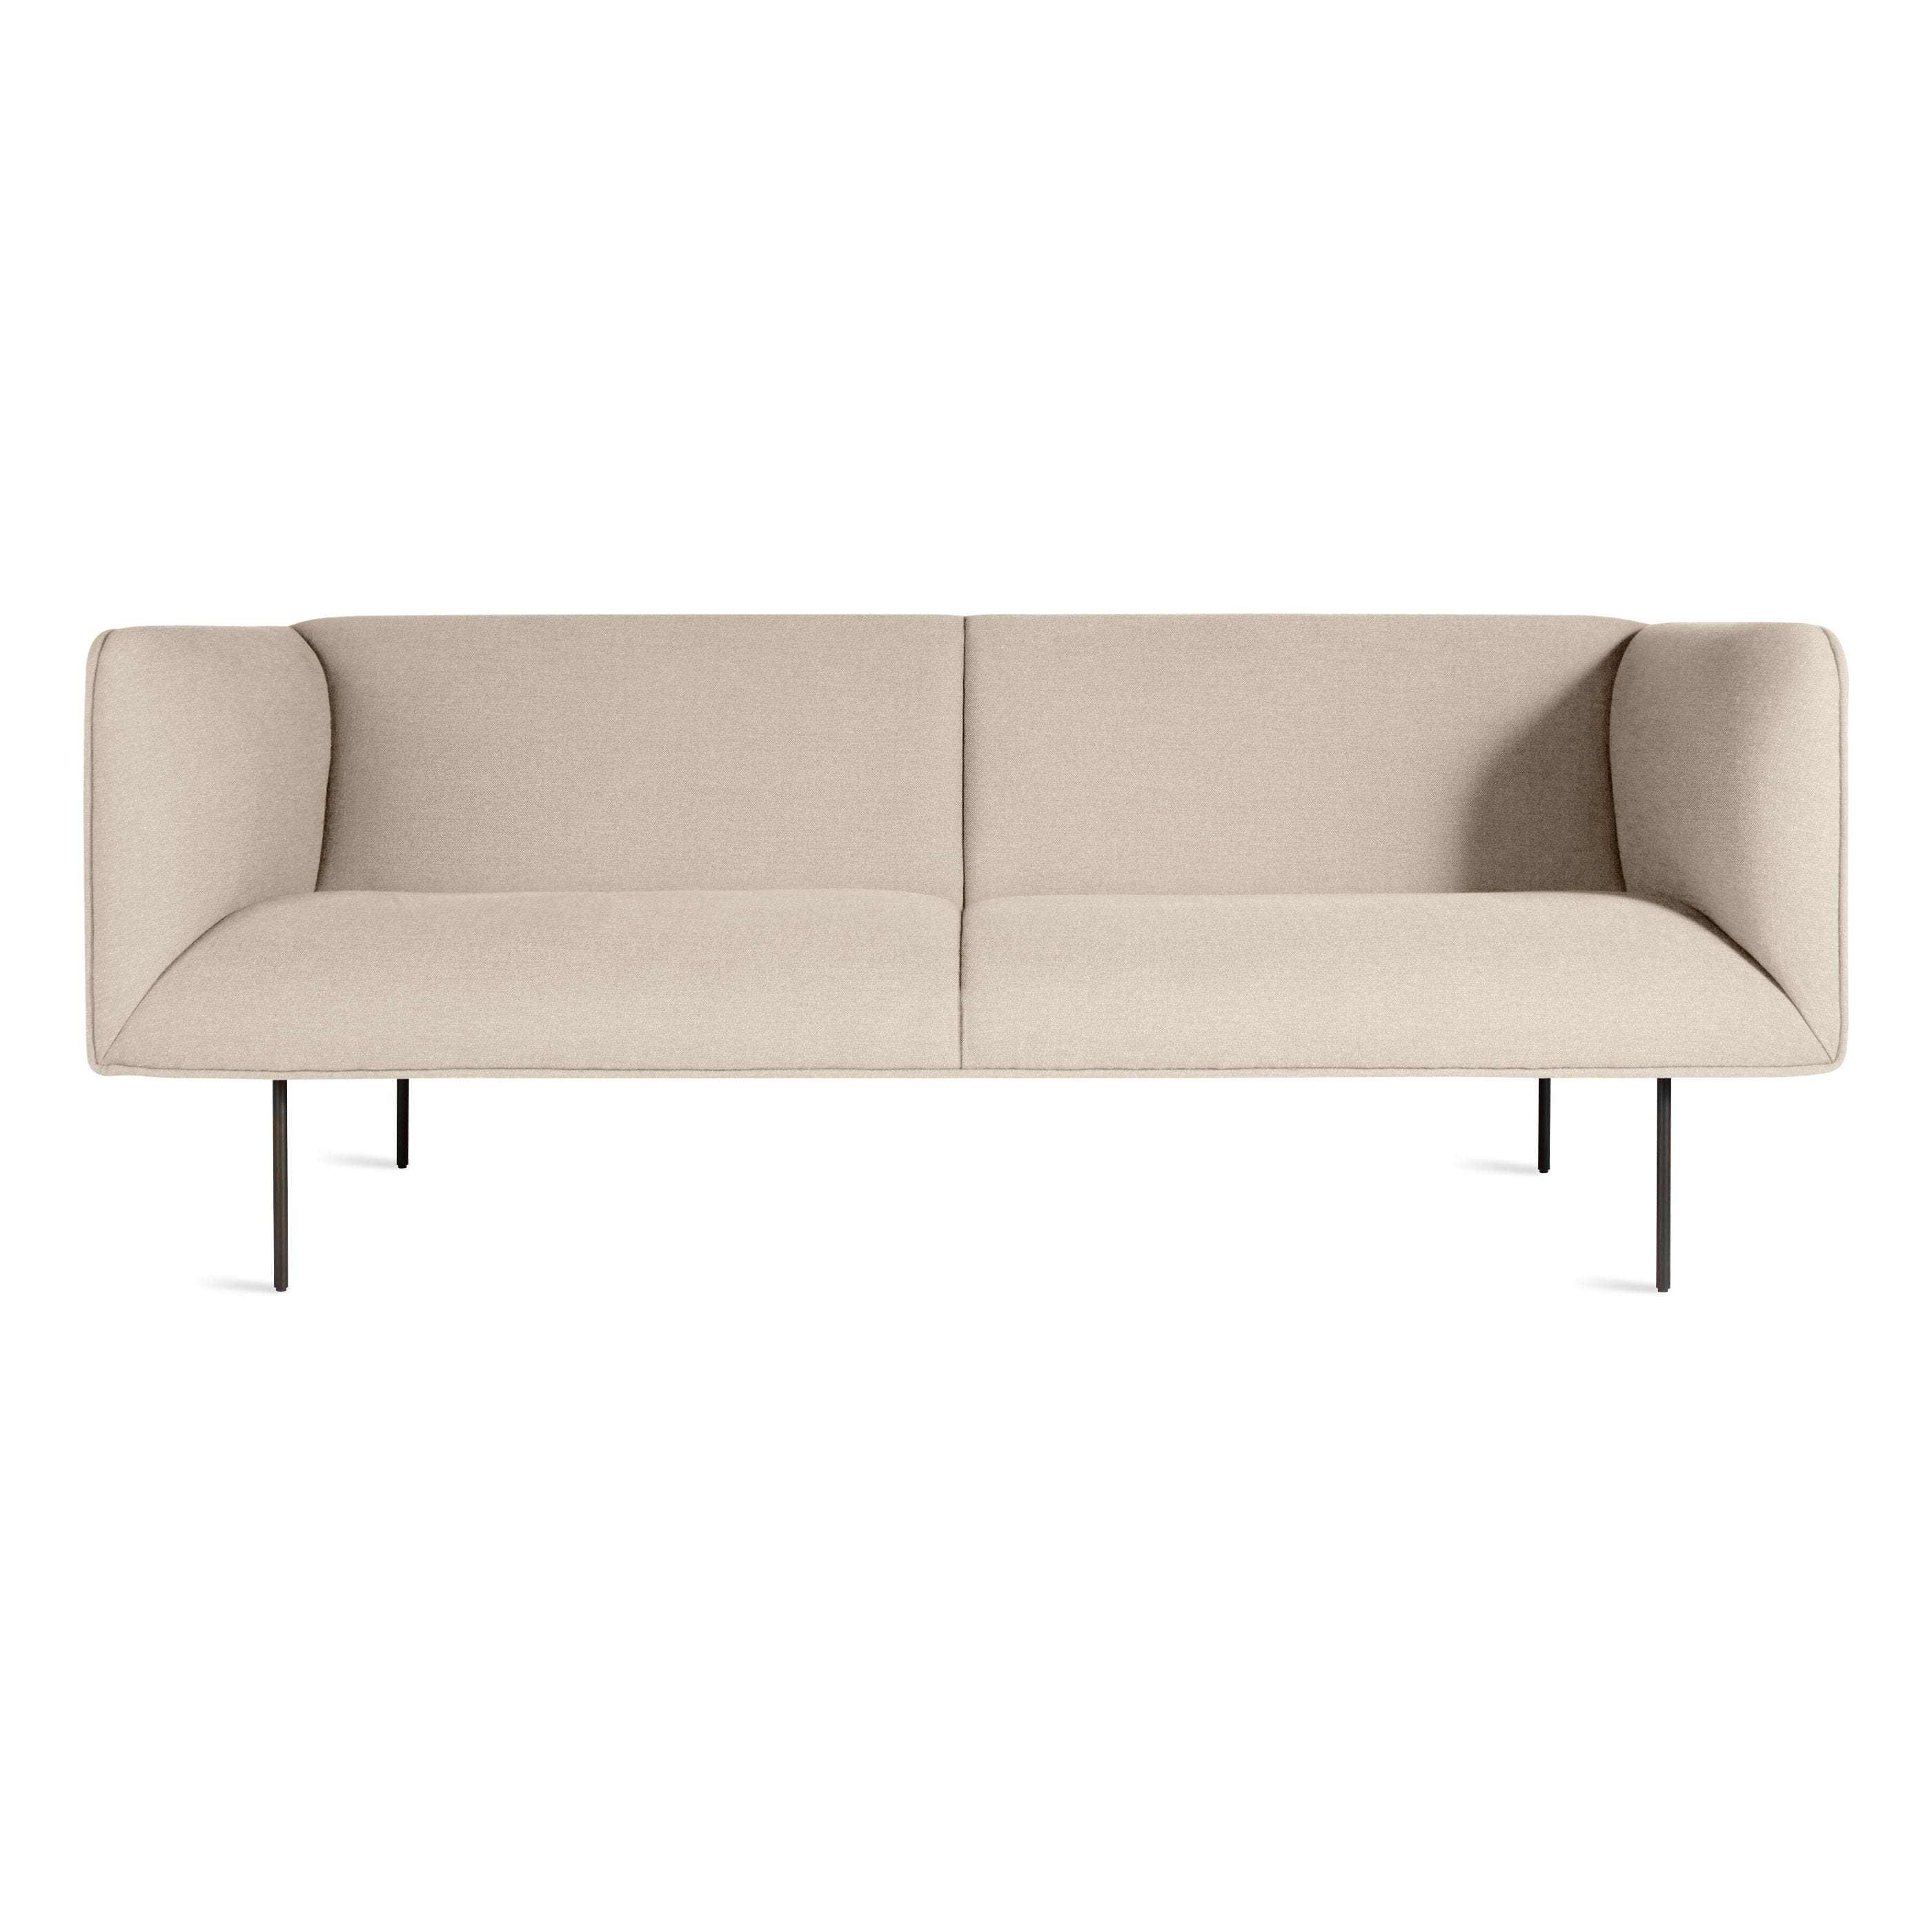 Modern Furniture   Blu Dot   Good Design Is Good.